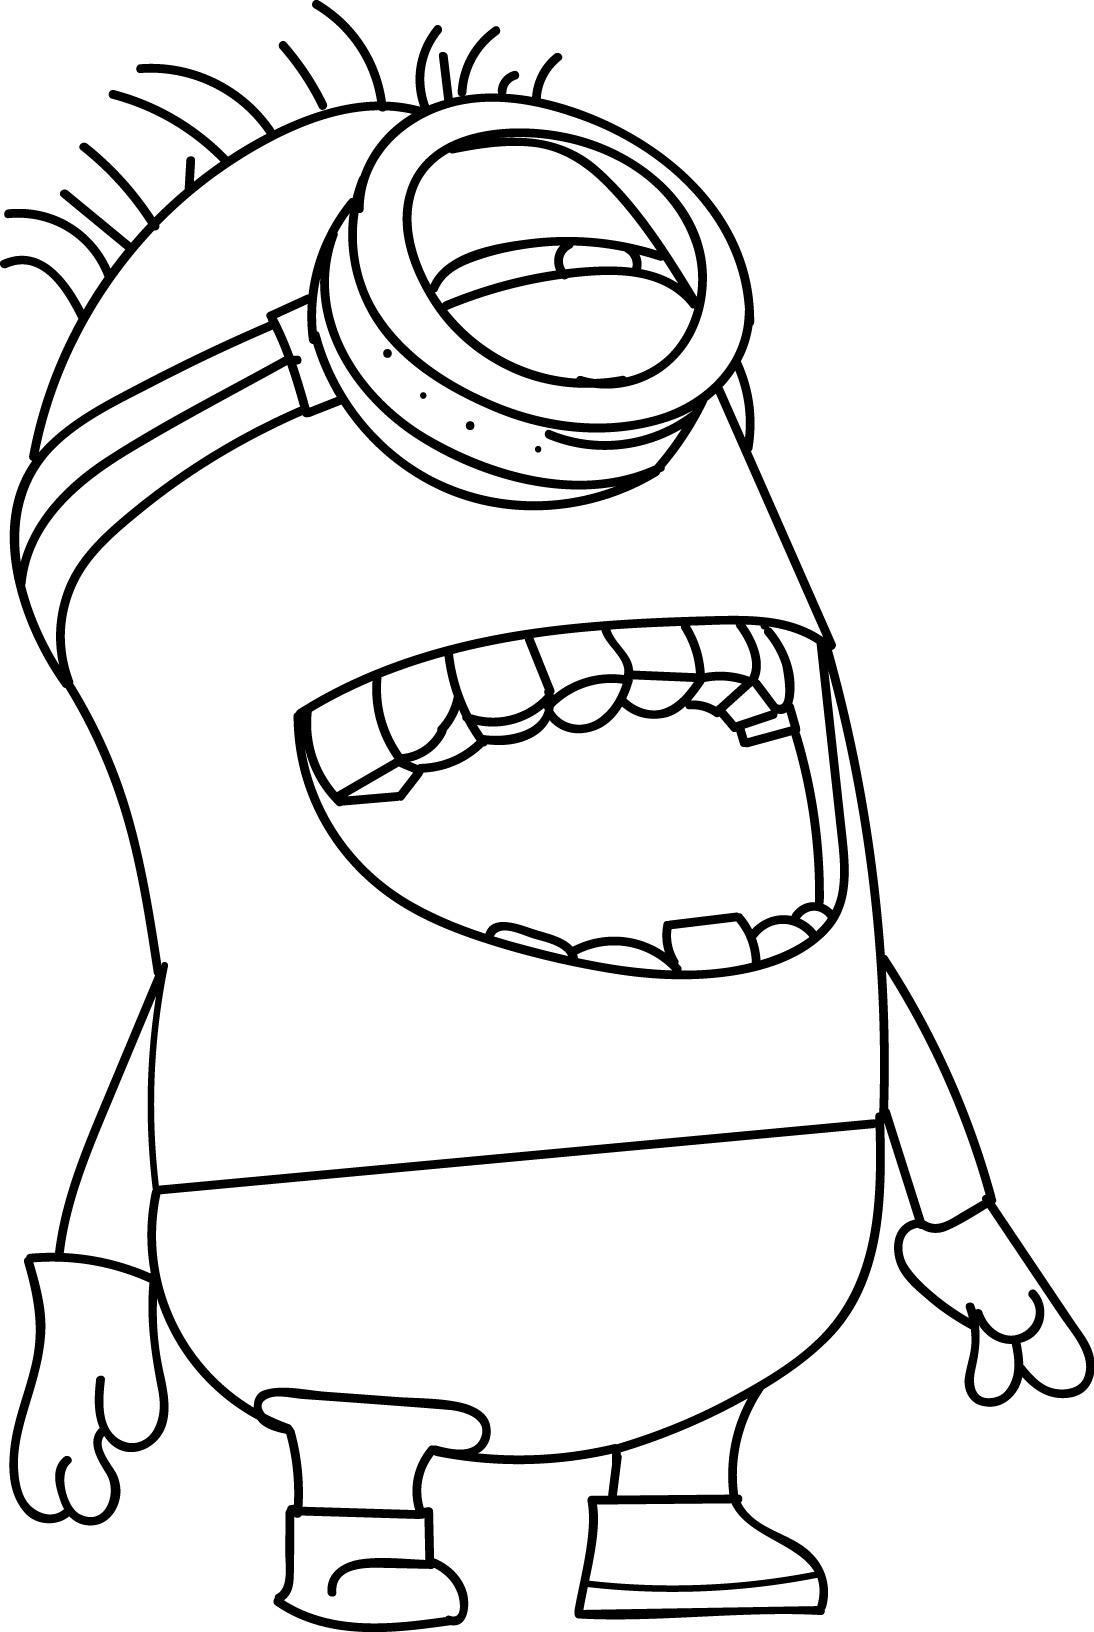 Minion Laugh Coloring Page